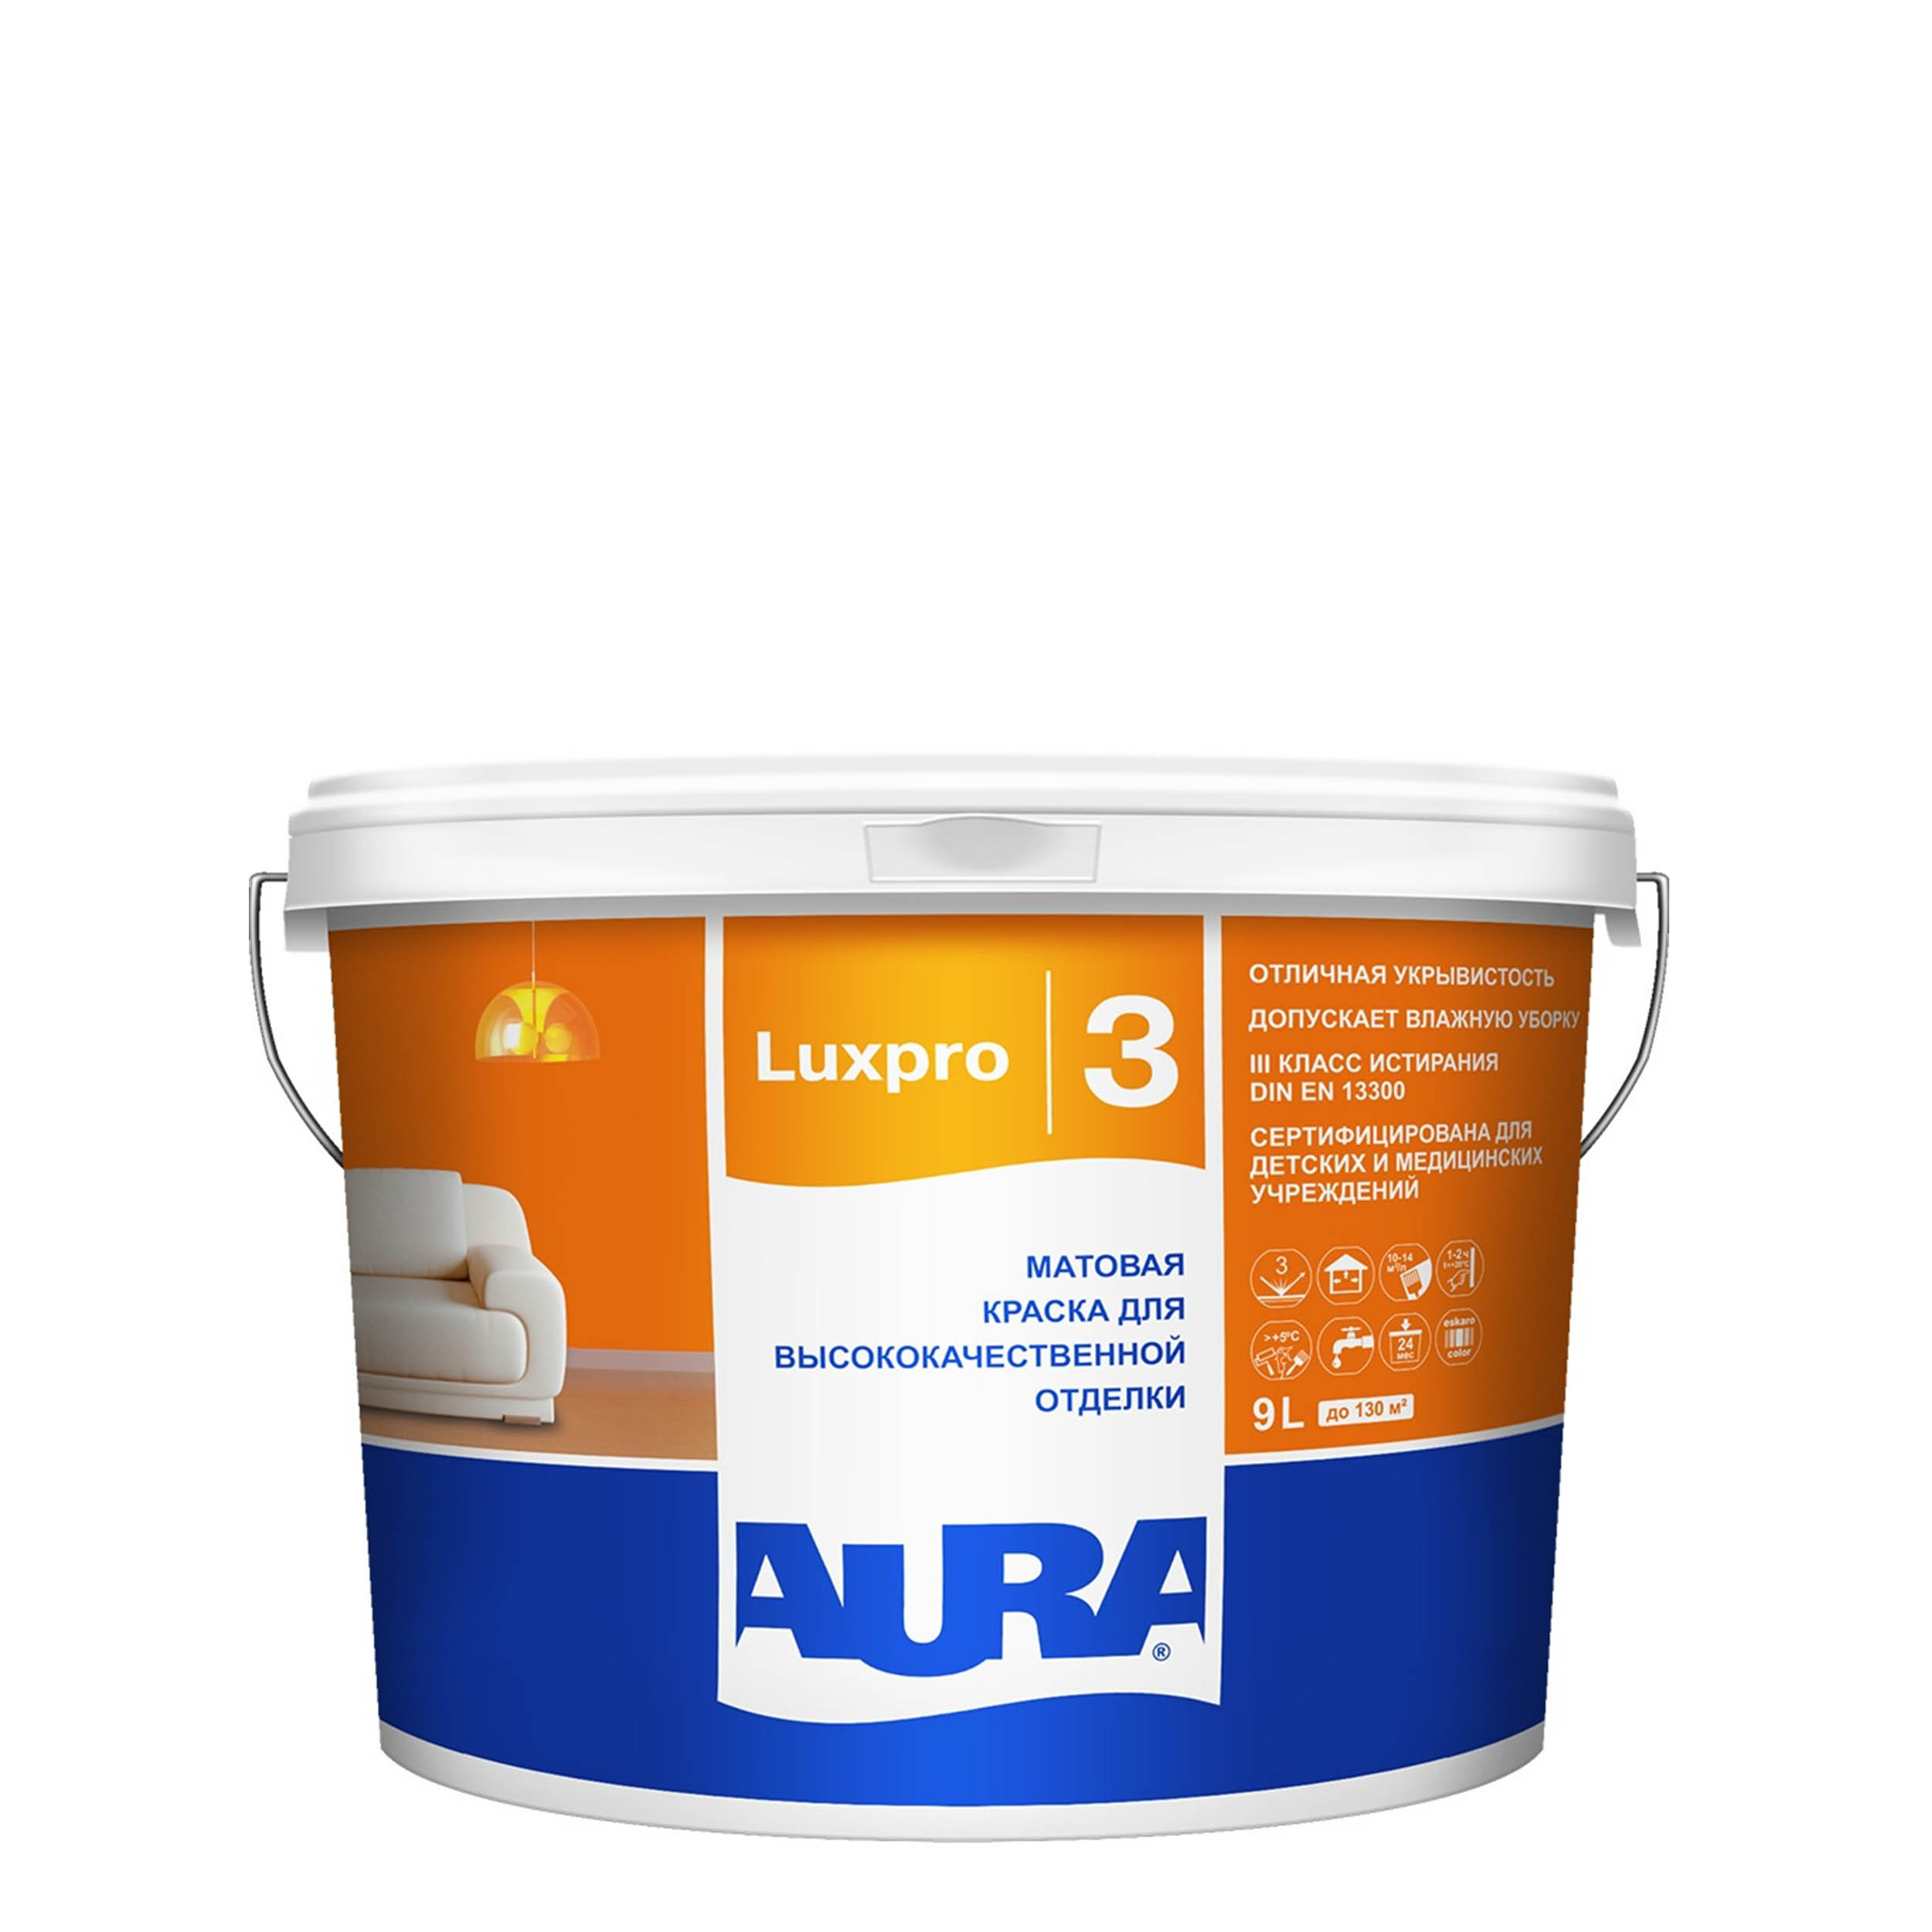 Фото 4 - Краска интерьерная, Aura LuxPRO 3, RAL 4008, 11 кг.